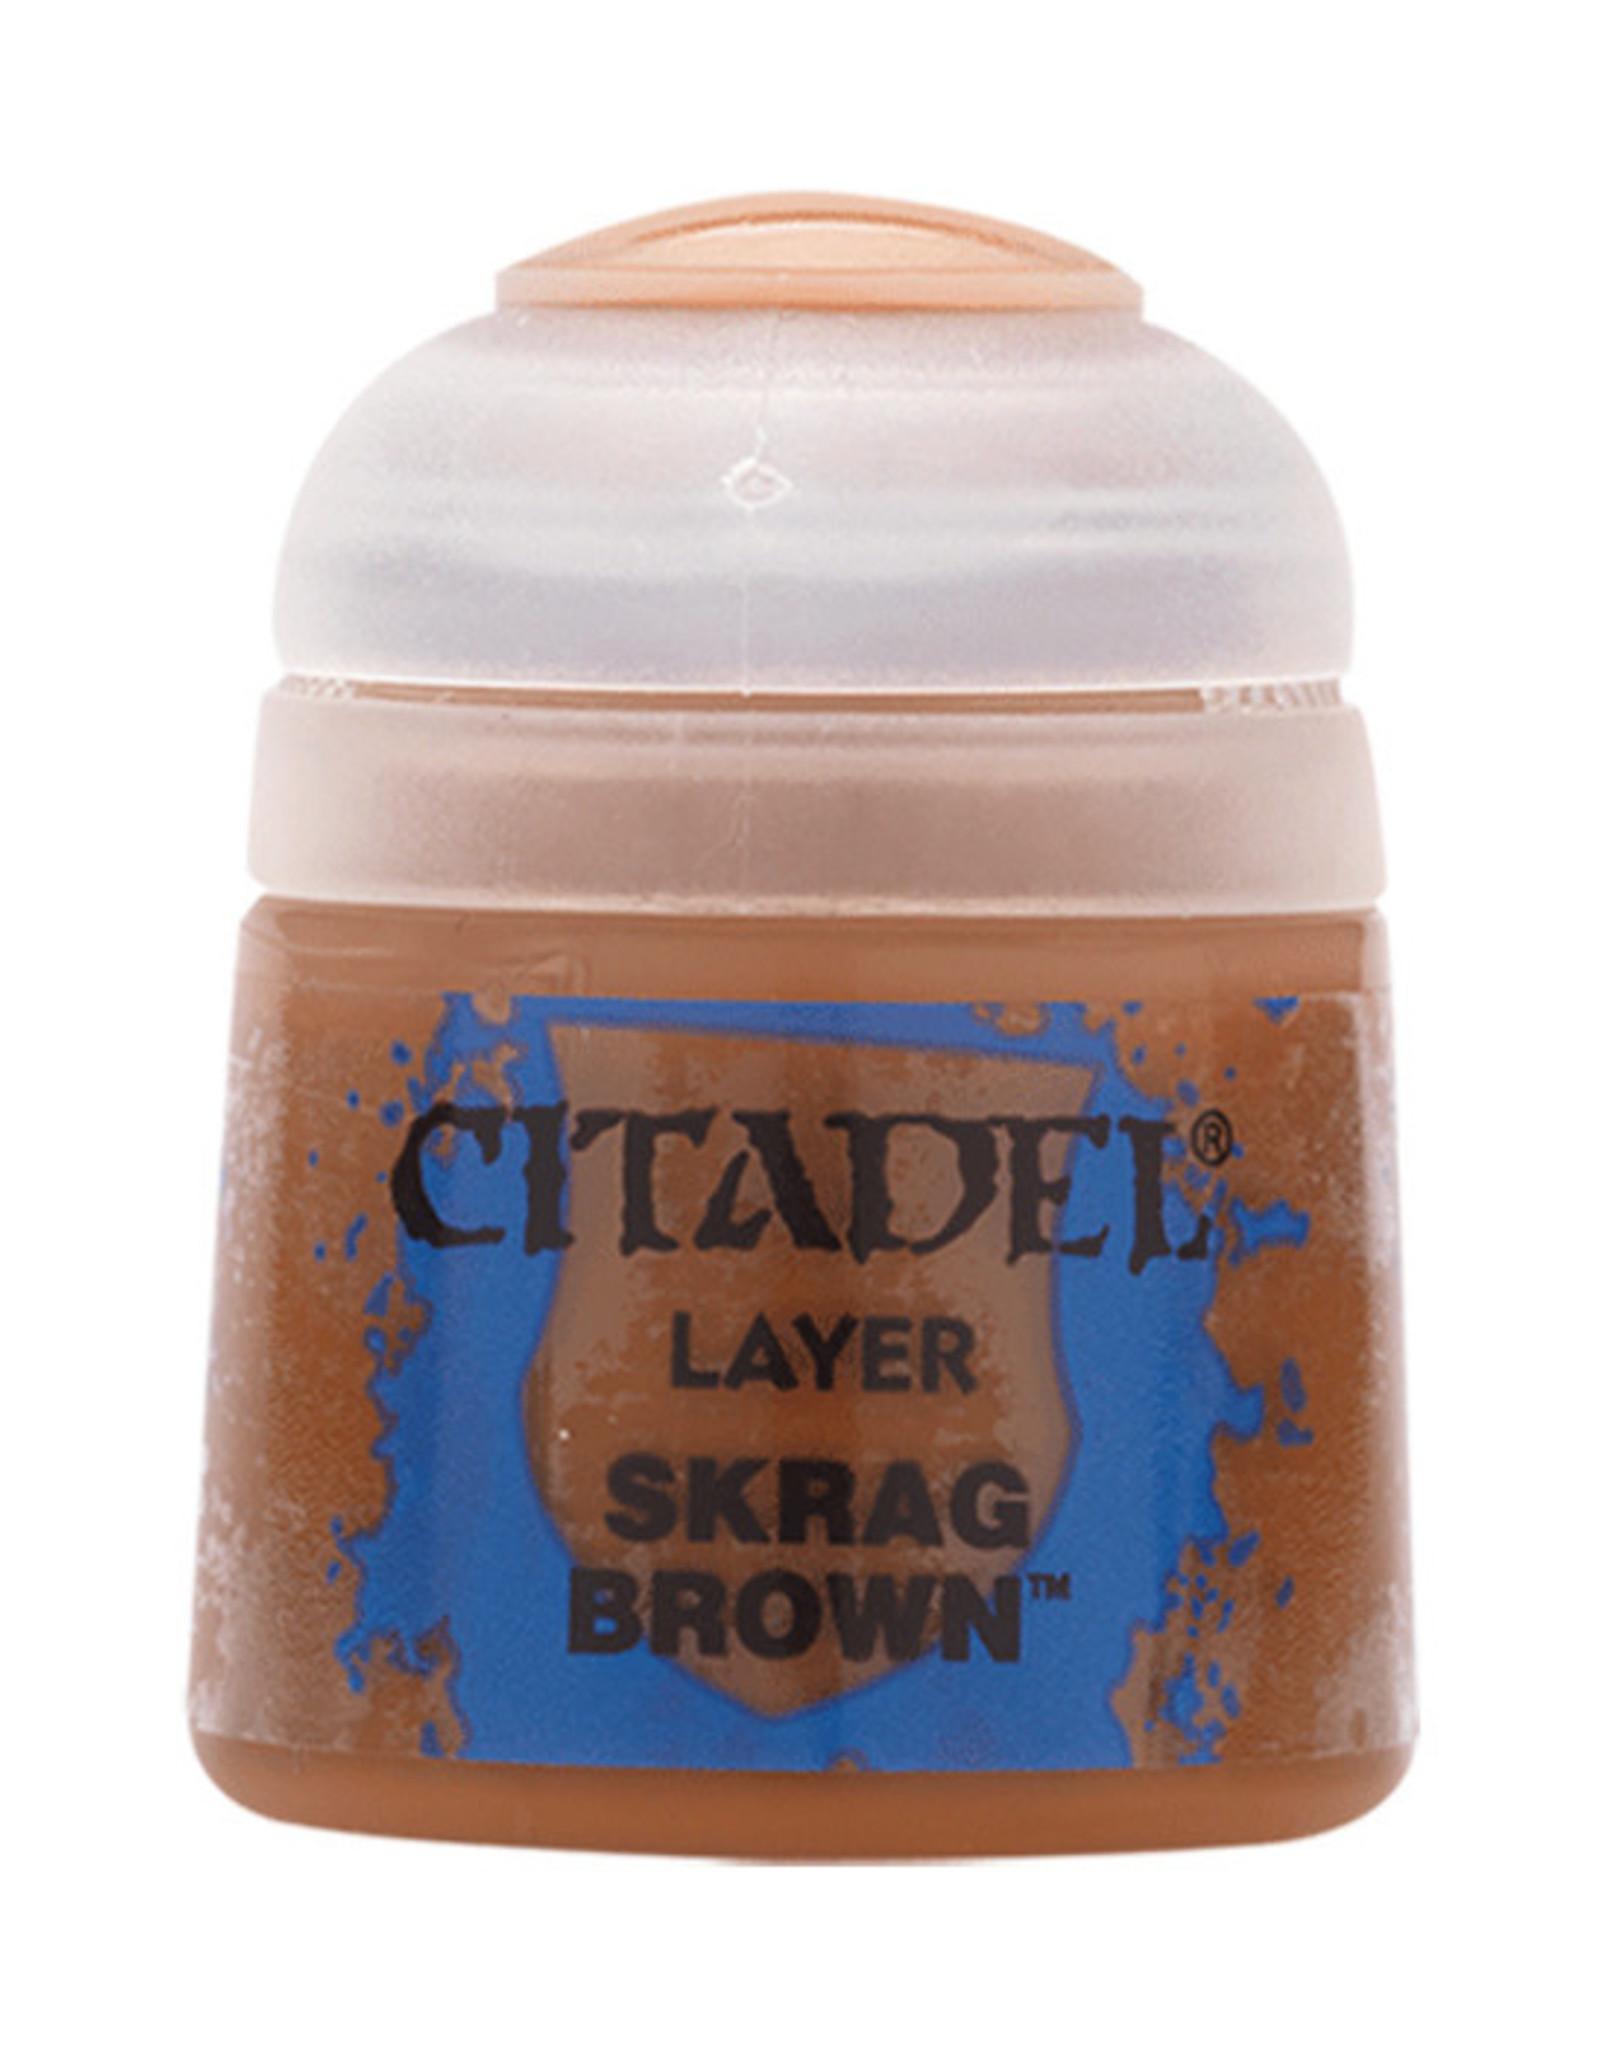 Citadel Citadel Colour: Layer - Skrag Brown